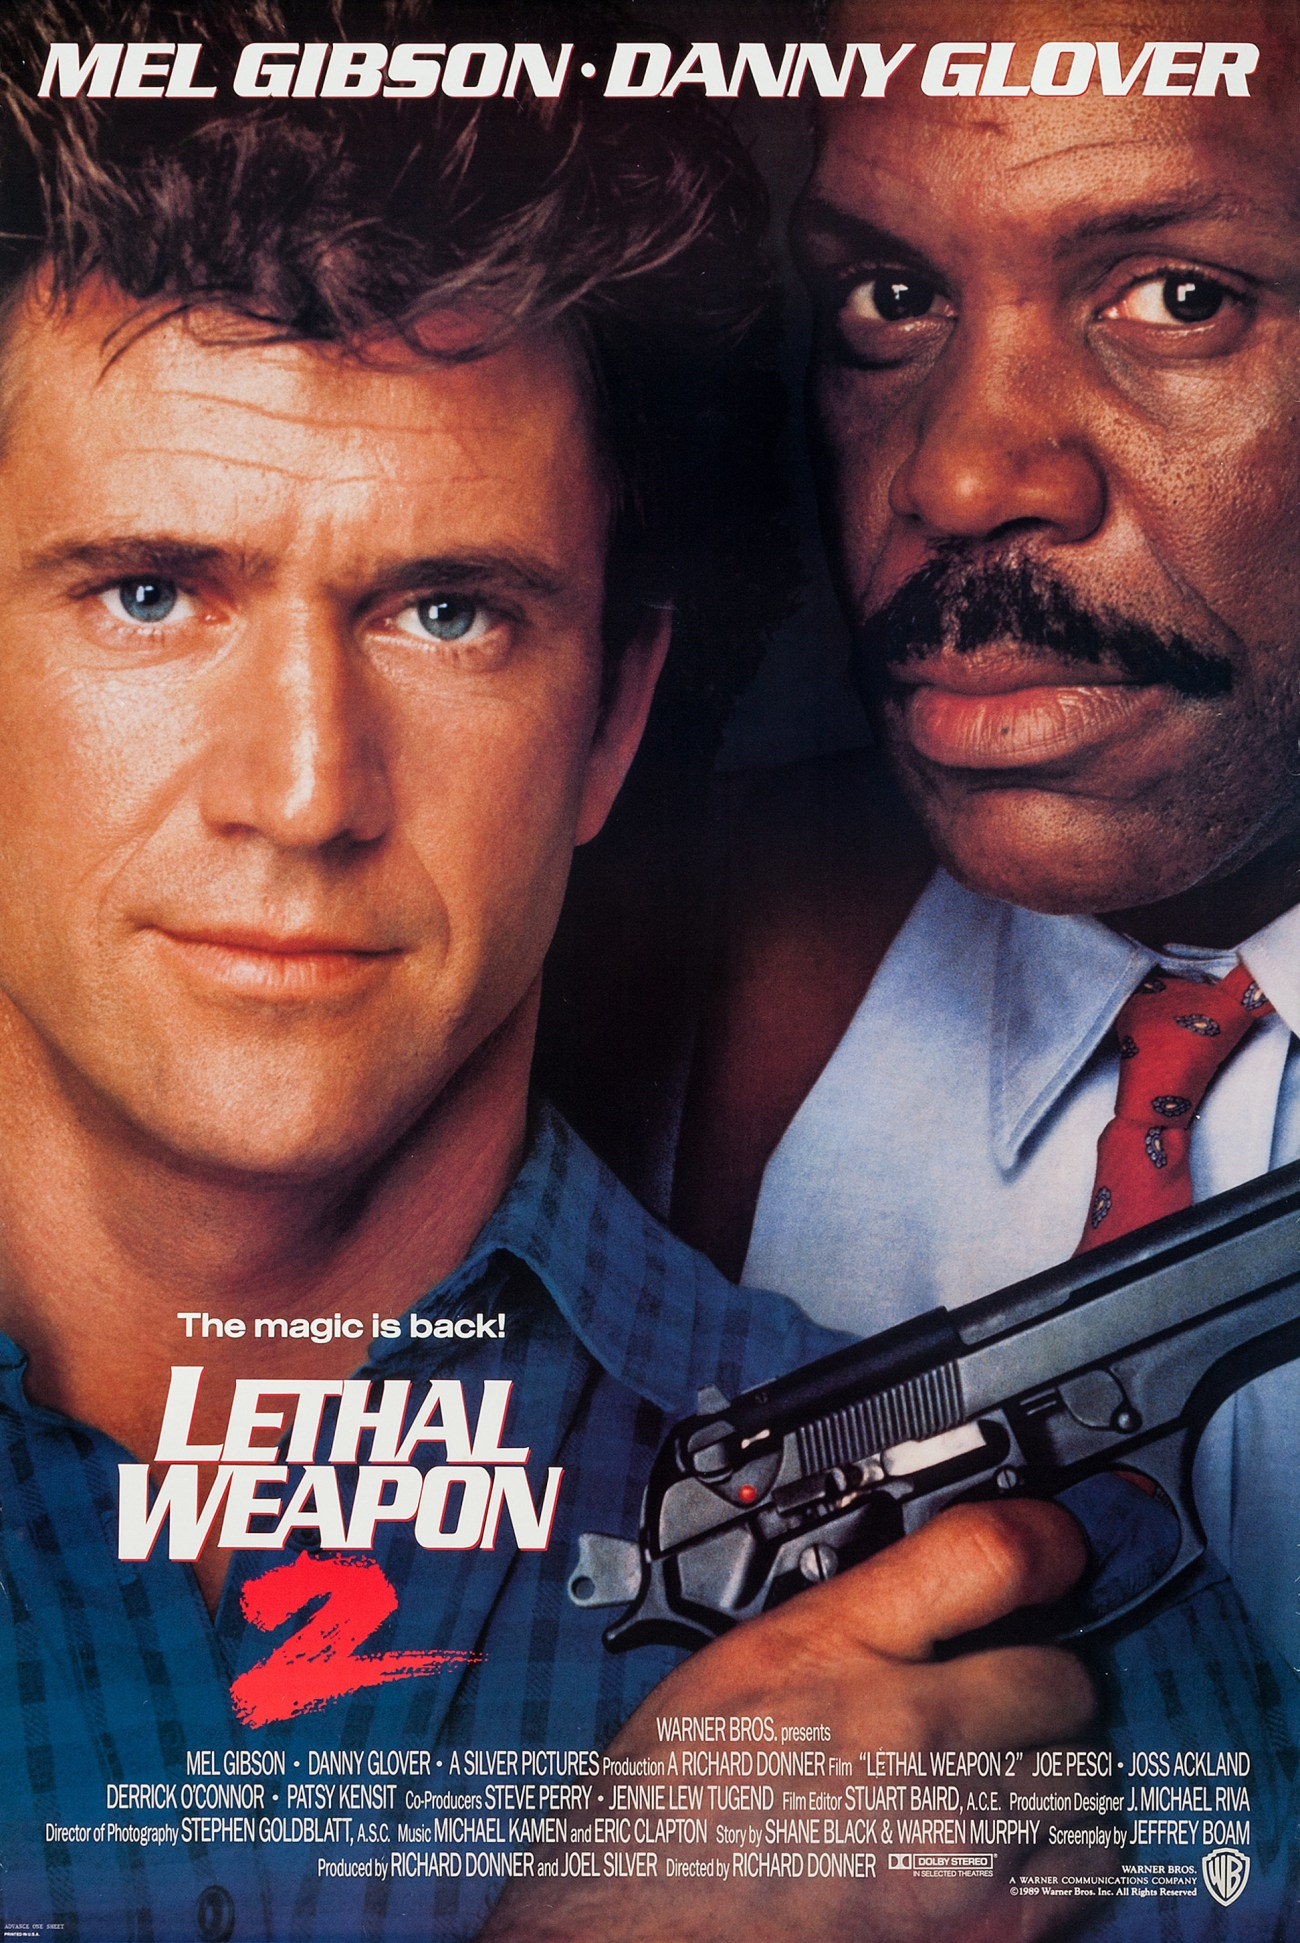 Póster de Lethal Weapon 2 (1989). Imagen: impawards.com